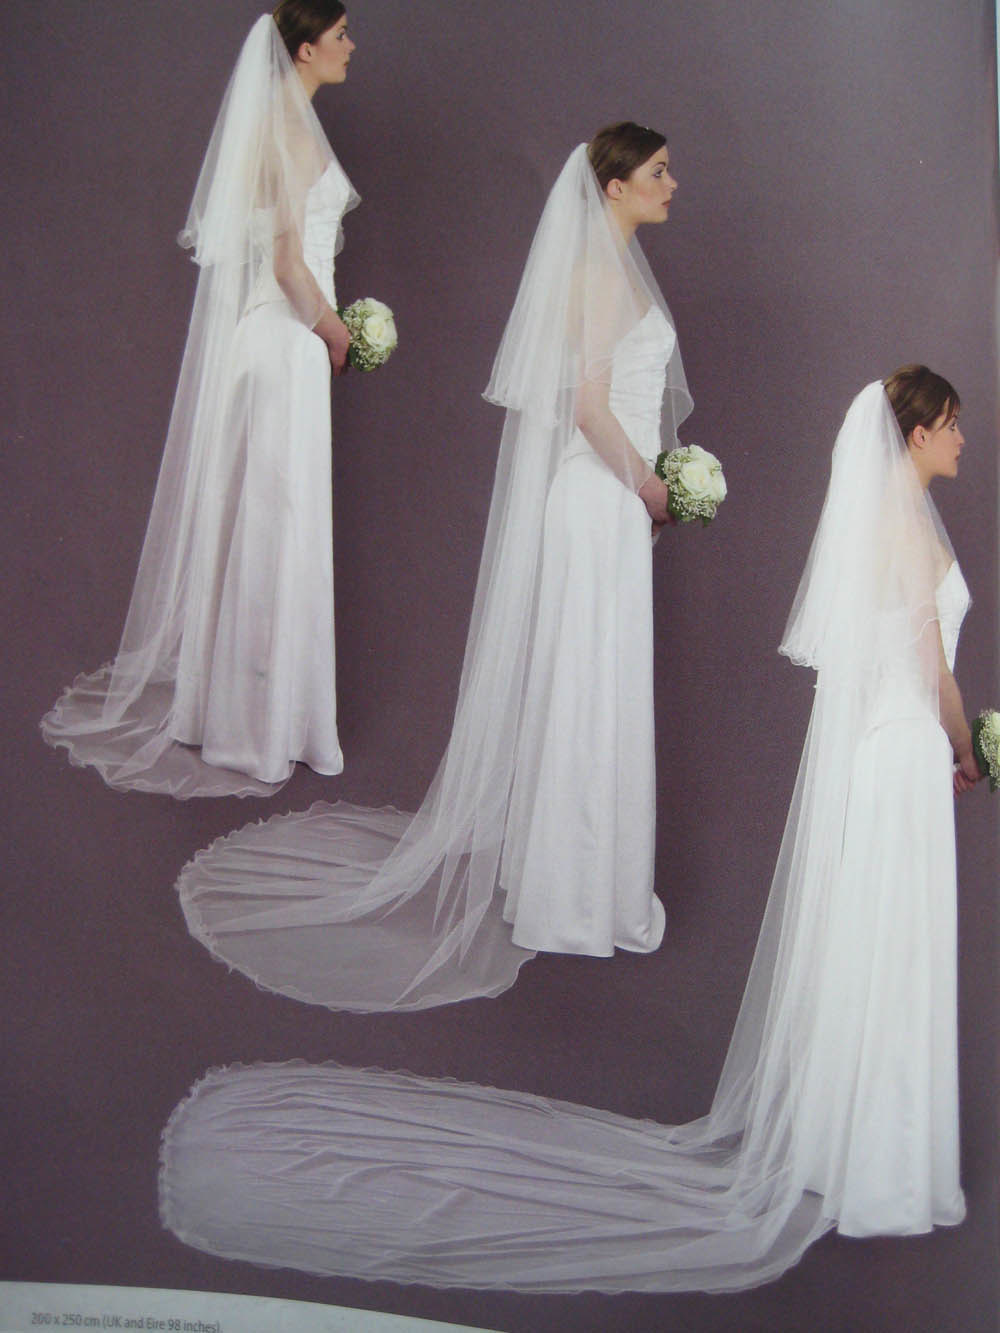 J And J Auto >> China Long Bridal Veils Ev241 - China Wedding Veils ...